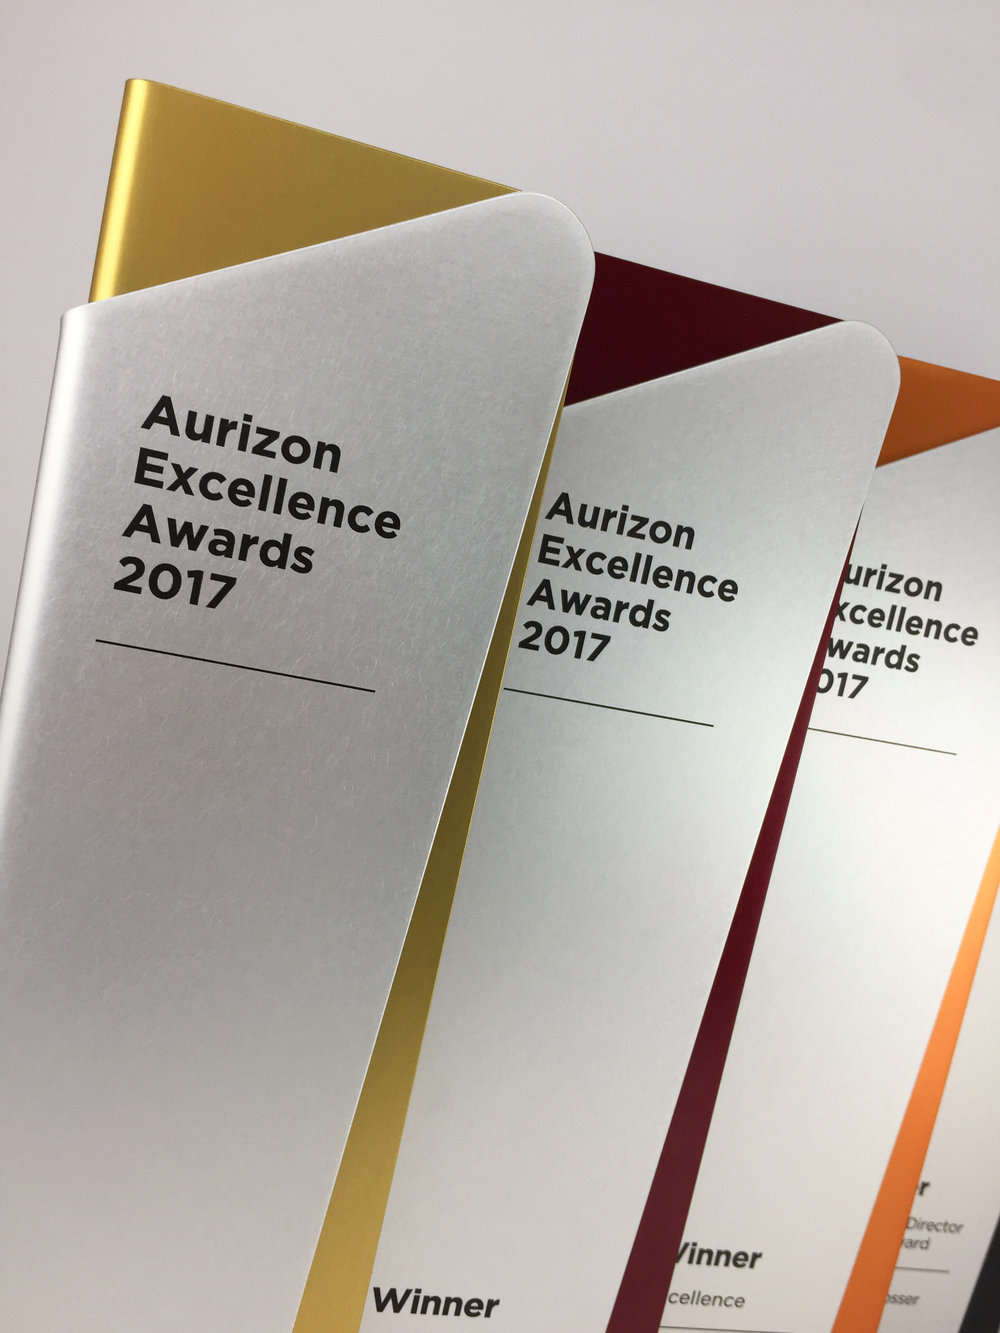 aurizon-excellence-awards-aluminium-corporate-trophy-02.jpg